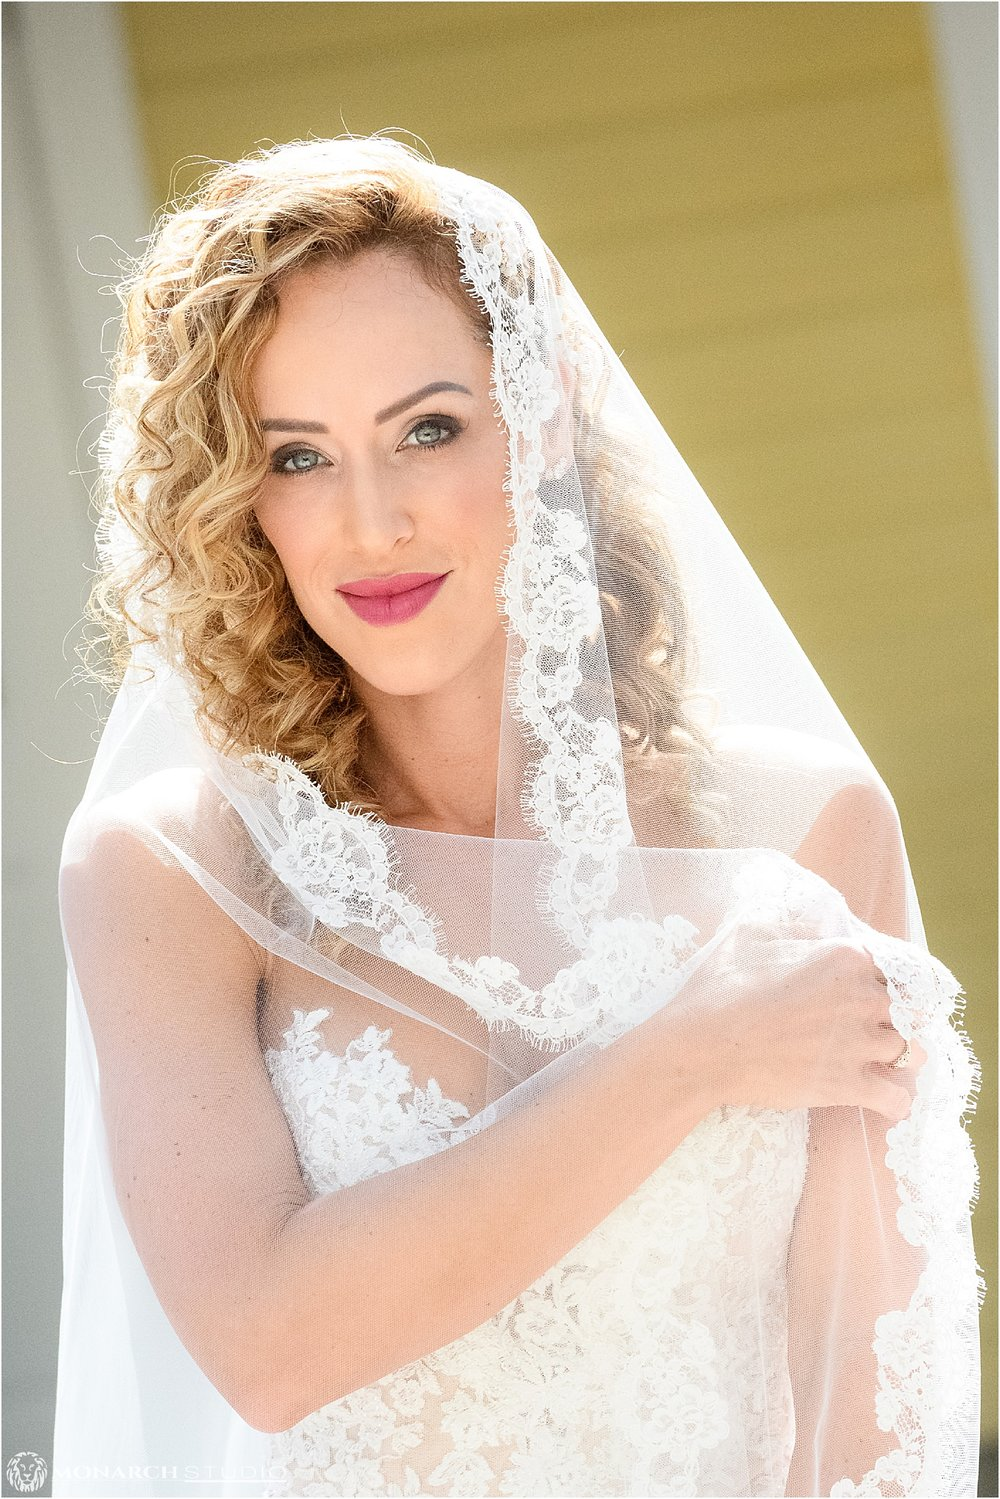 The-Whiteroom-Wedding-Photography-Saint-Augustine-Florida (24).jpg